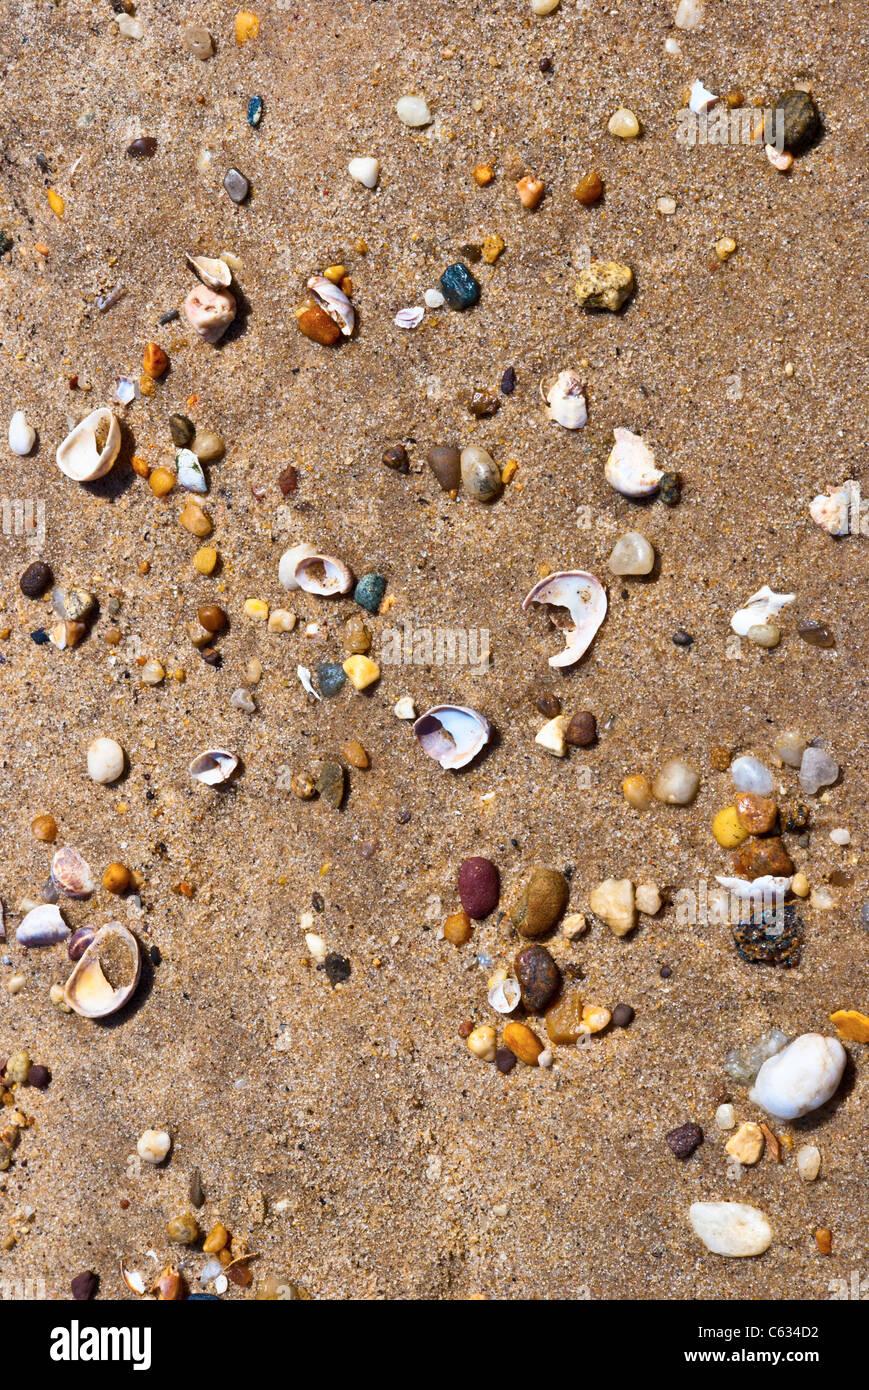 Steinen, Muscheln, Sand Abstraktion Stockbild